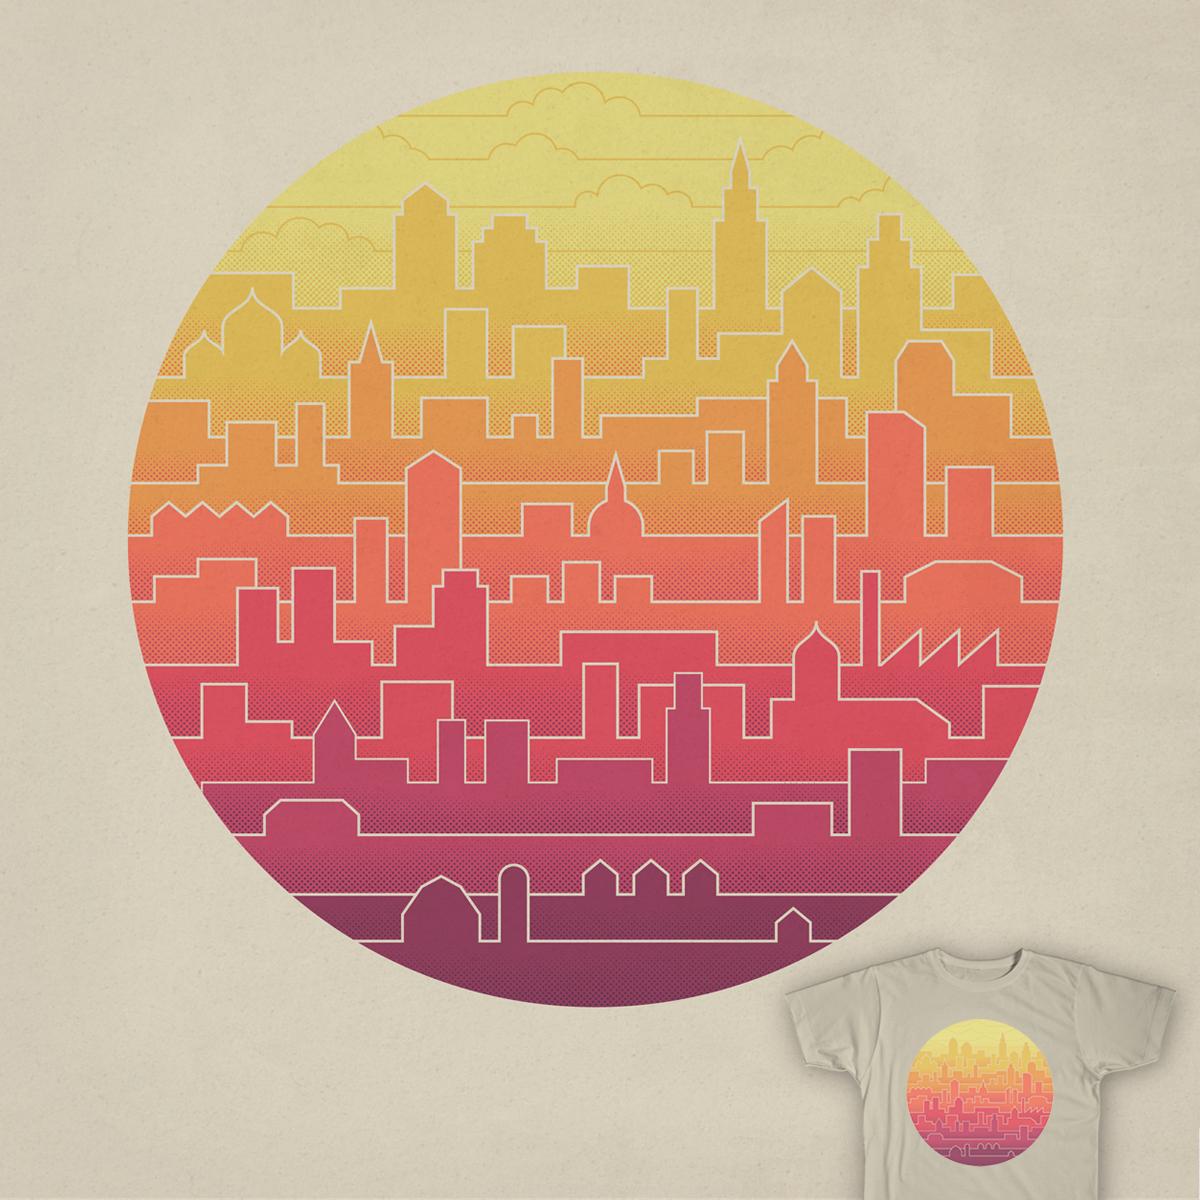 Skyline by ThePaperCrane on Threadless